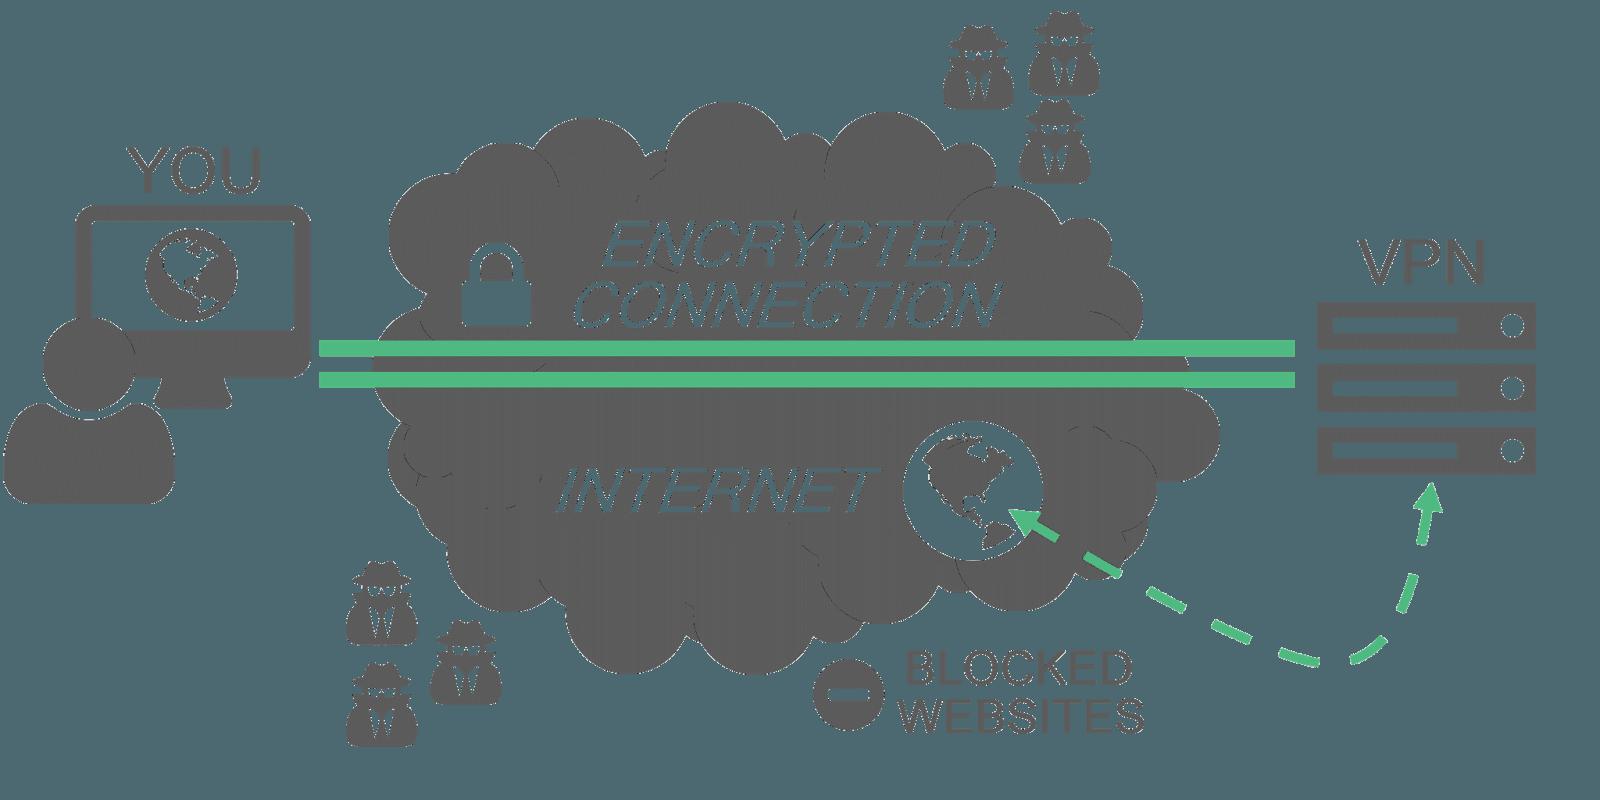 VPN kryptering forklaring